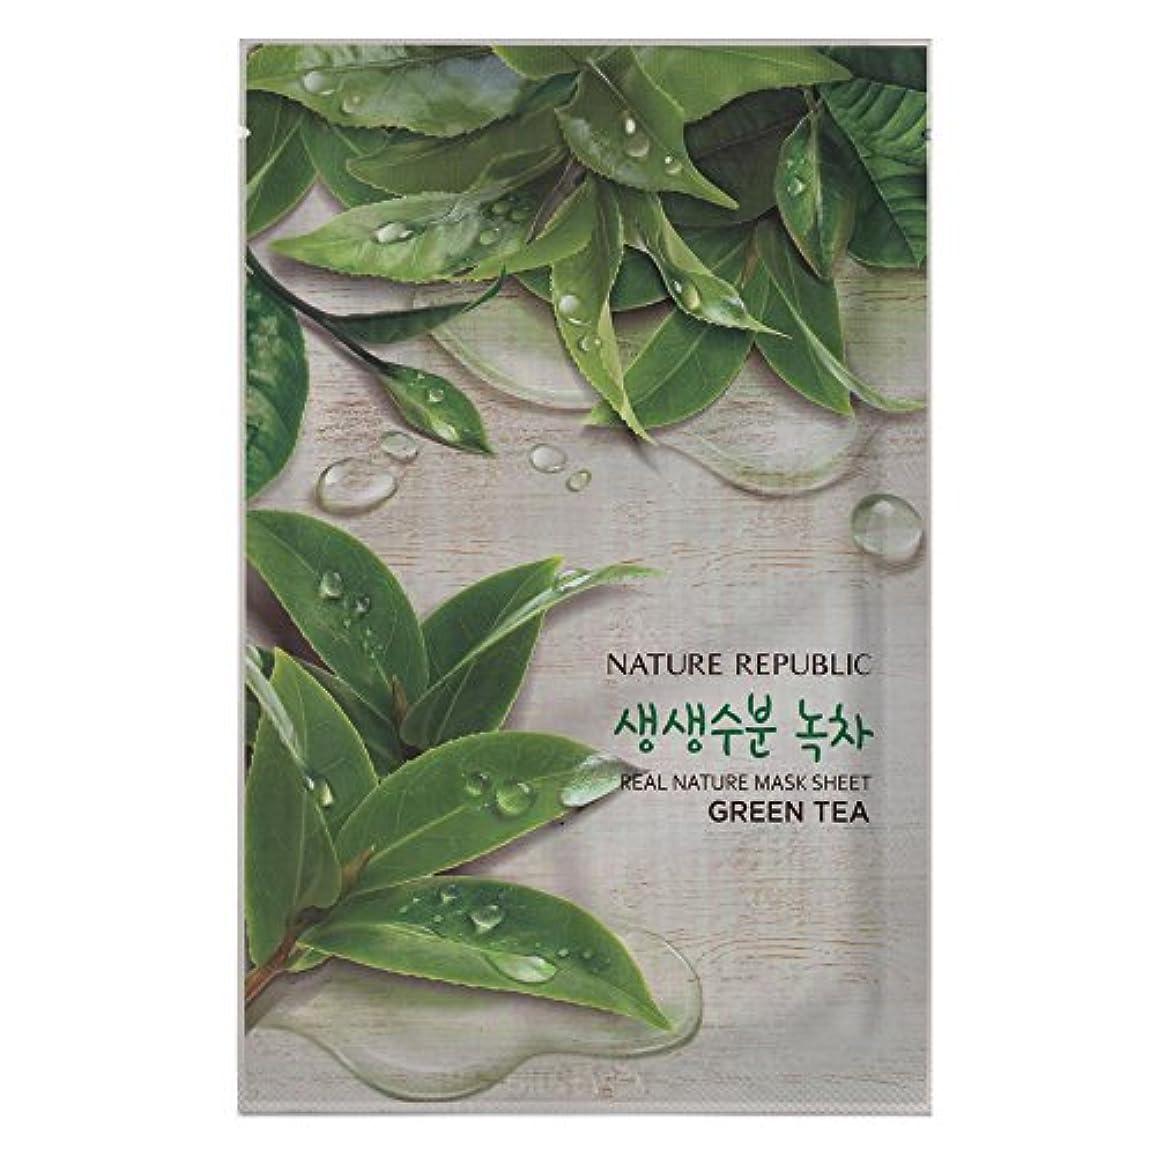 [NATURE REPUBLIC] リアルネイチャー マスクシート Real Nature Mask Sheet (Green Tea (緑茶) 10個) [並行輸入品]